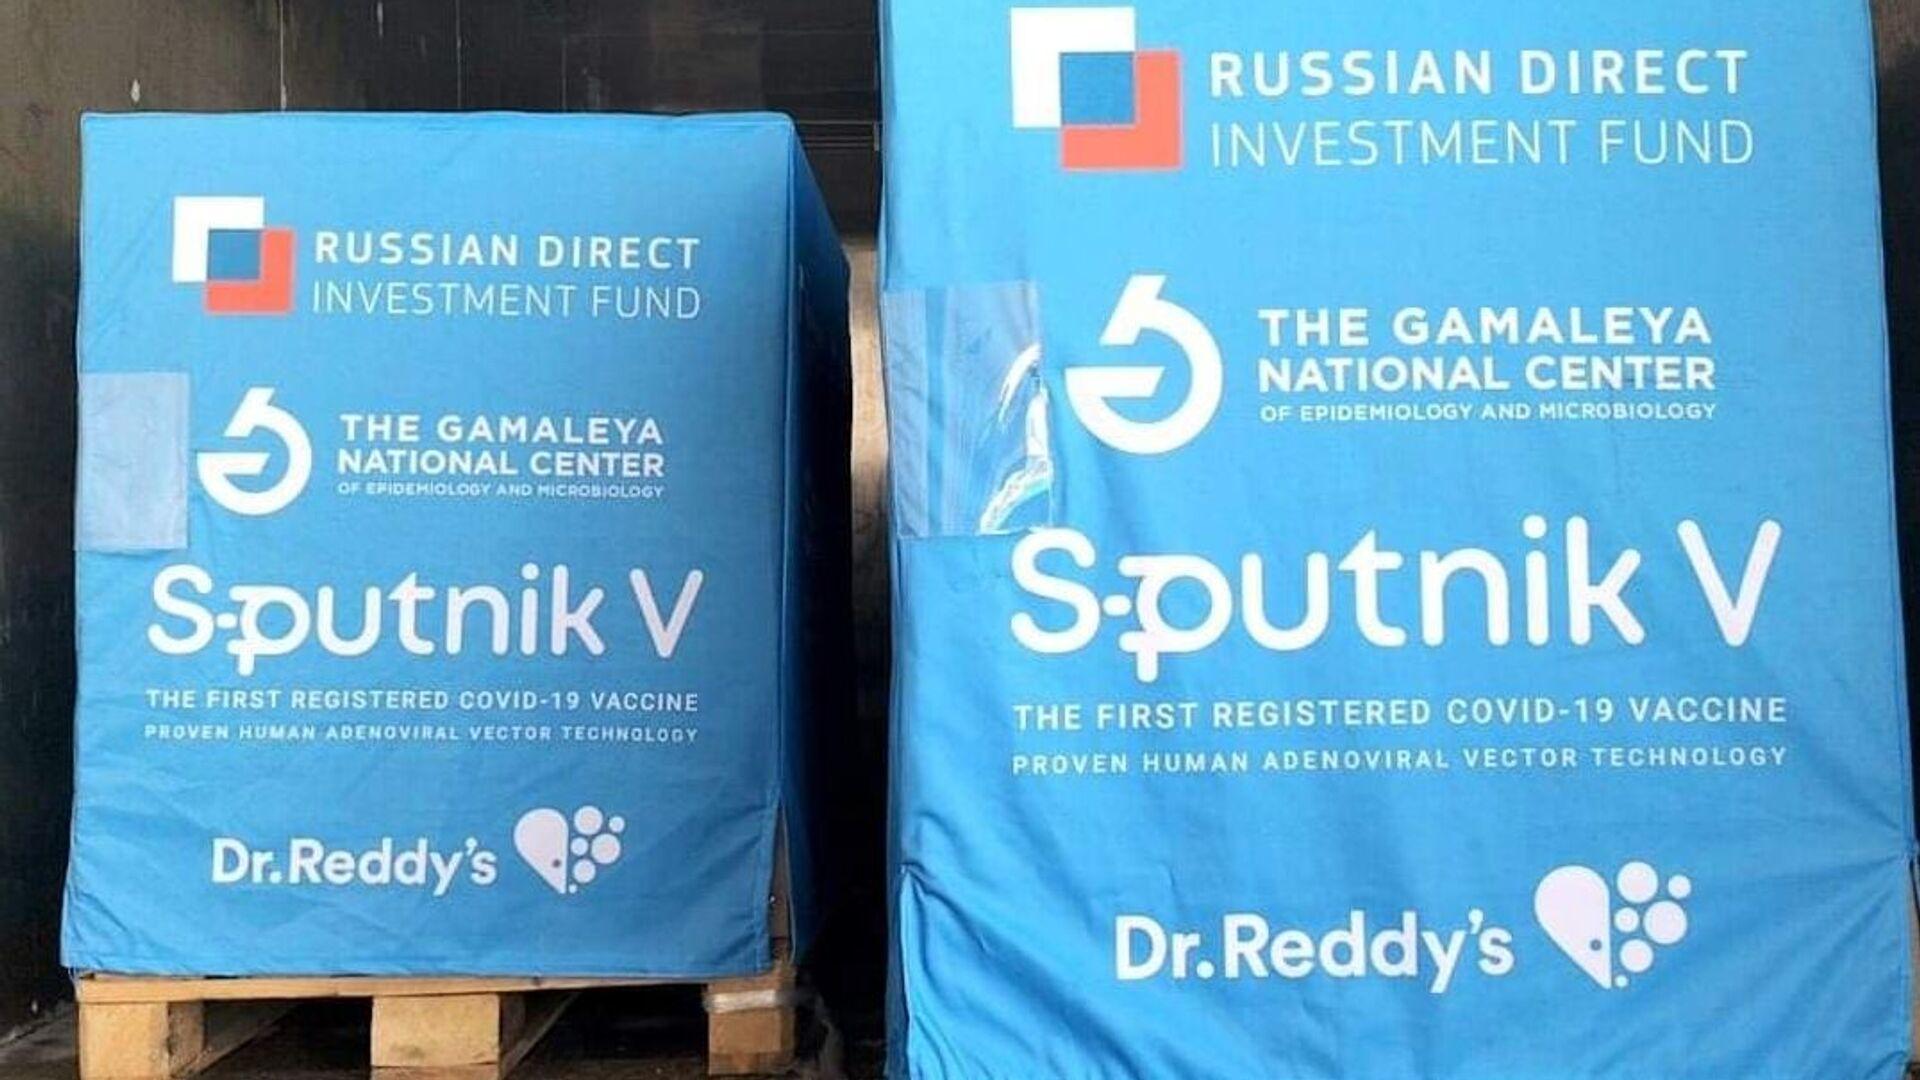 Rusya, Meksika'ya Sputnik V aşı üretim teknolojisini aktaracak